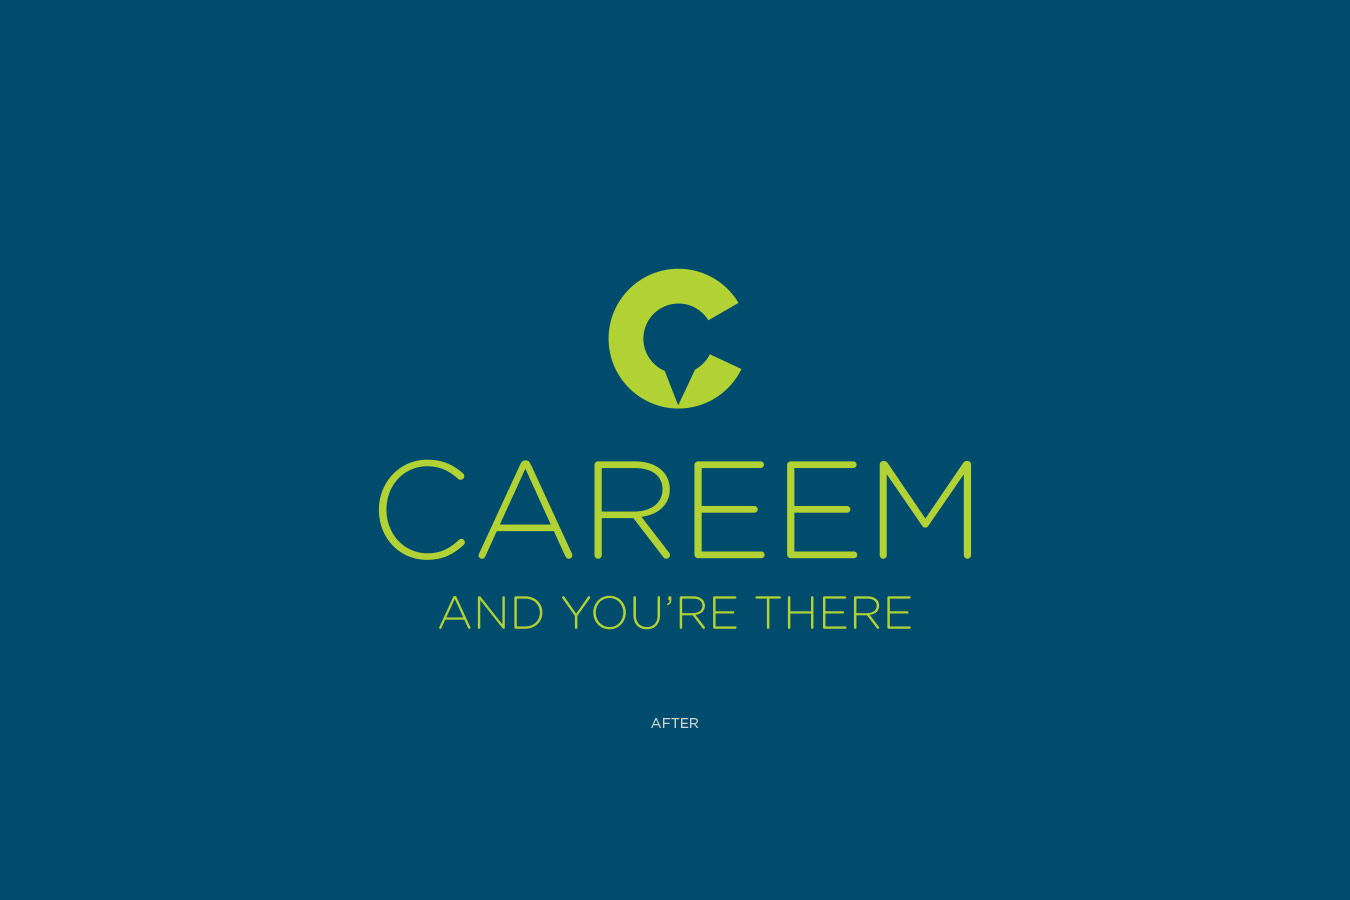 Careem-Logo-Design.jpg